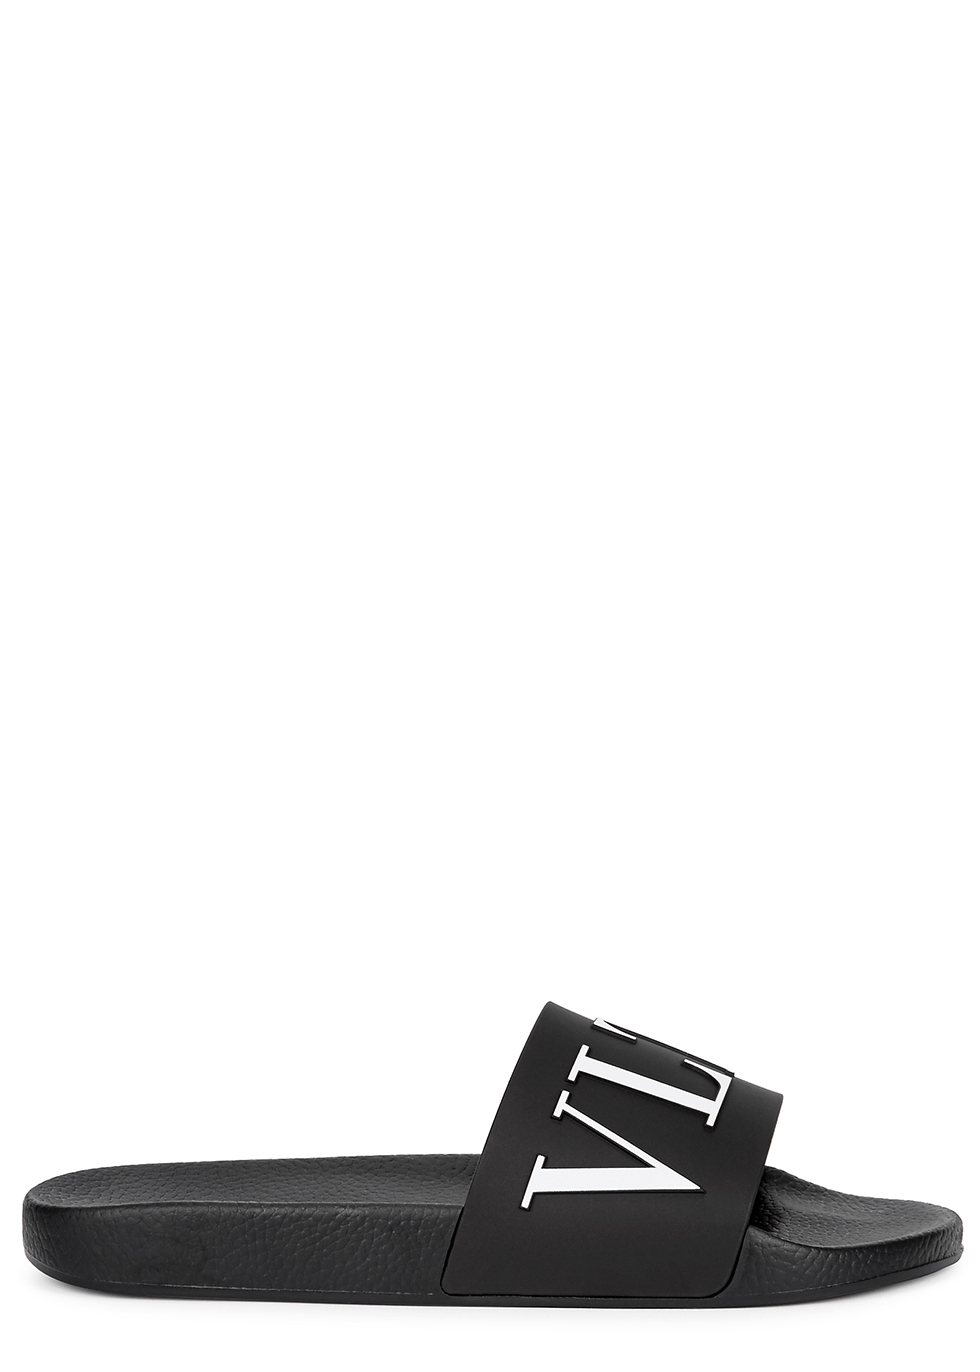 Valentino Garavani VLTN black rubber sliders